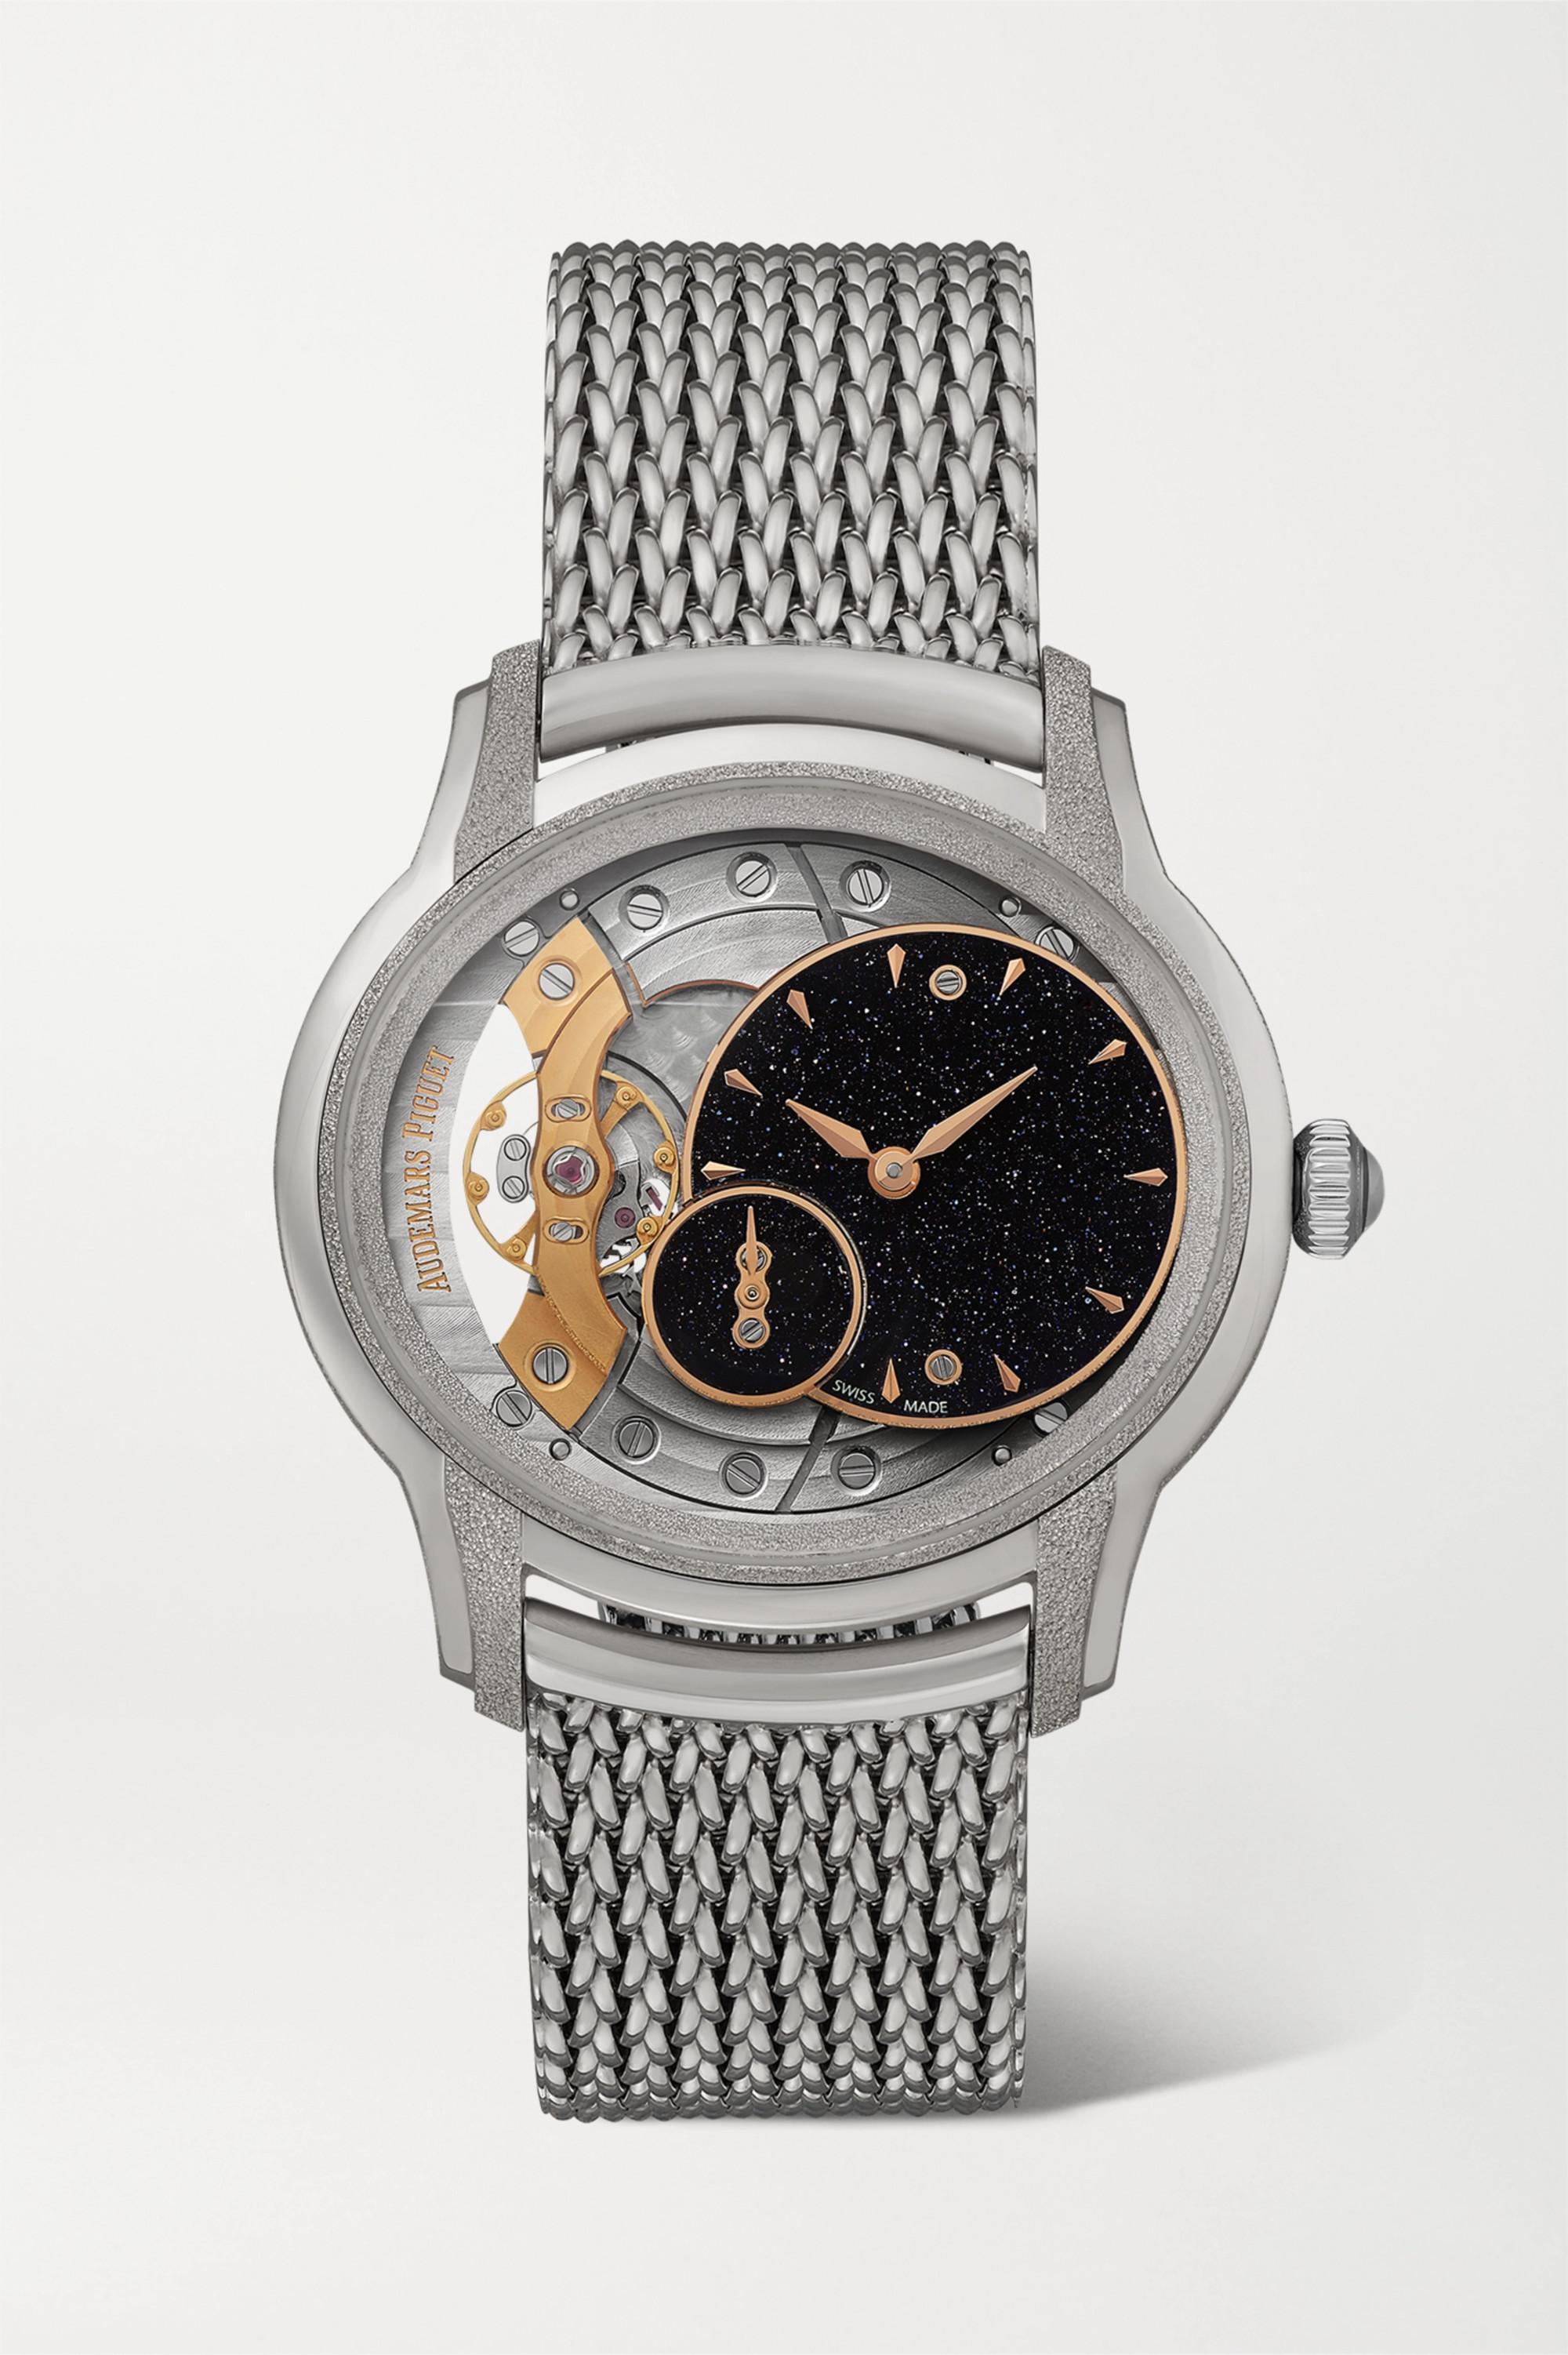 Audemars Piguet Millenary 39.5mm frosted 18-karat white gold and aventurine watch